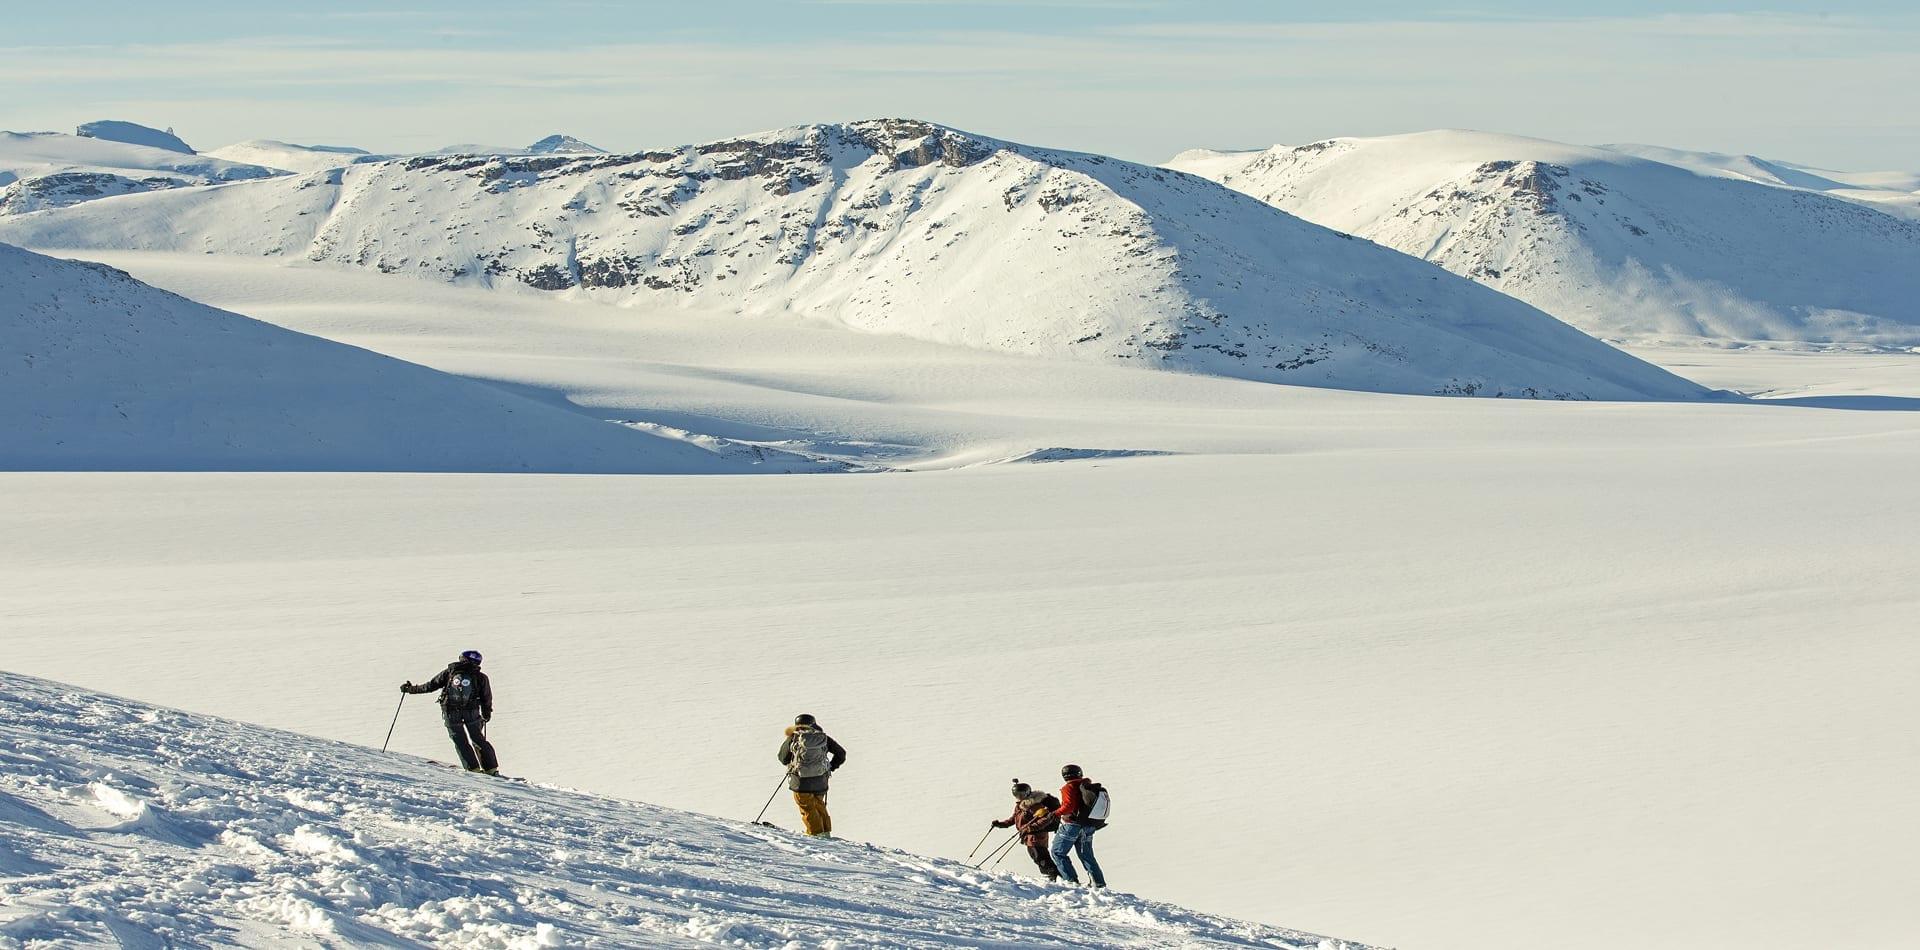 HERO Heli skiing Baffin Island